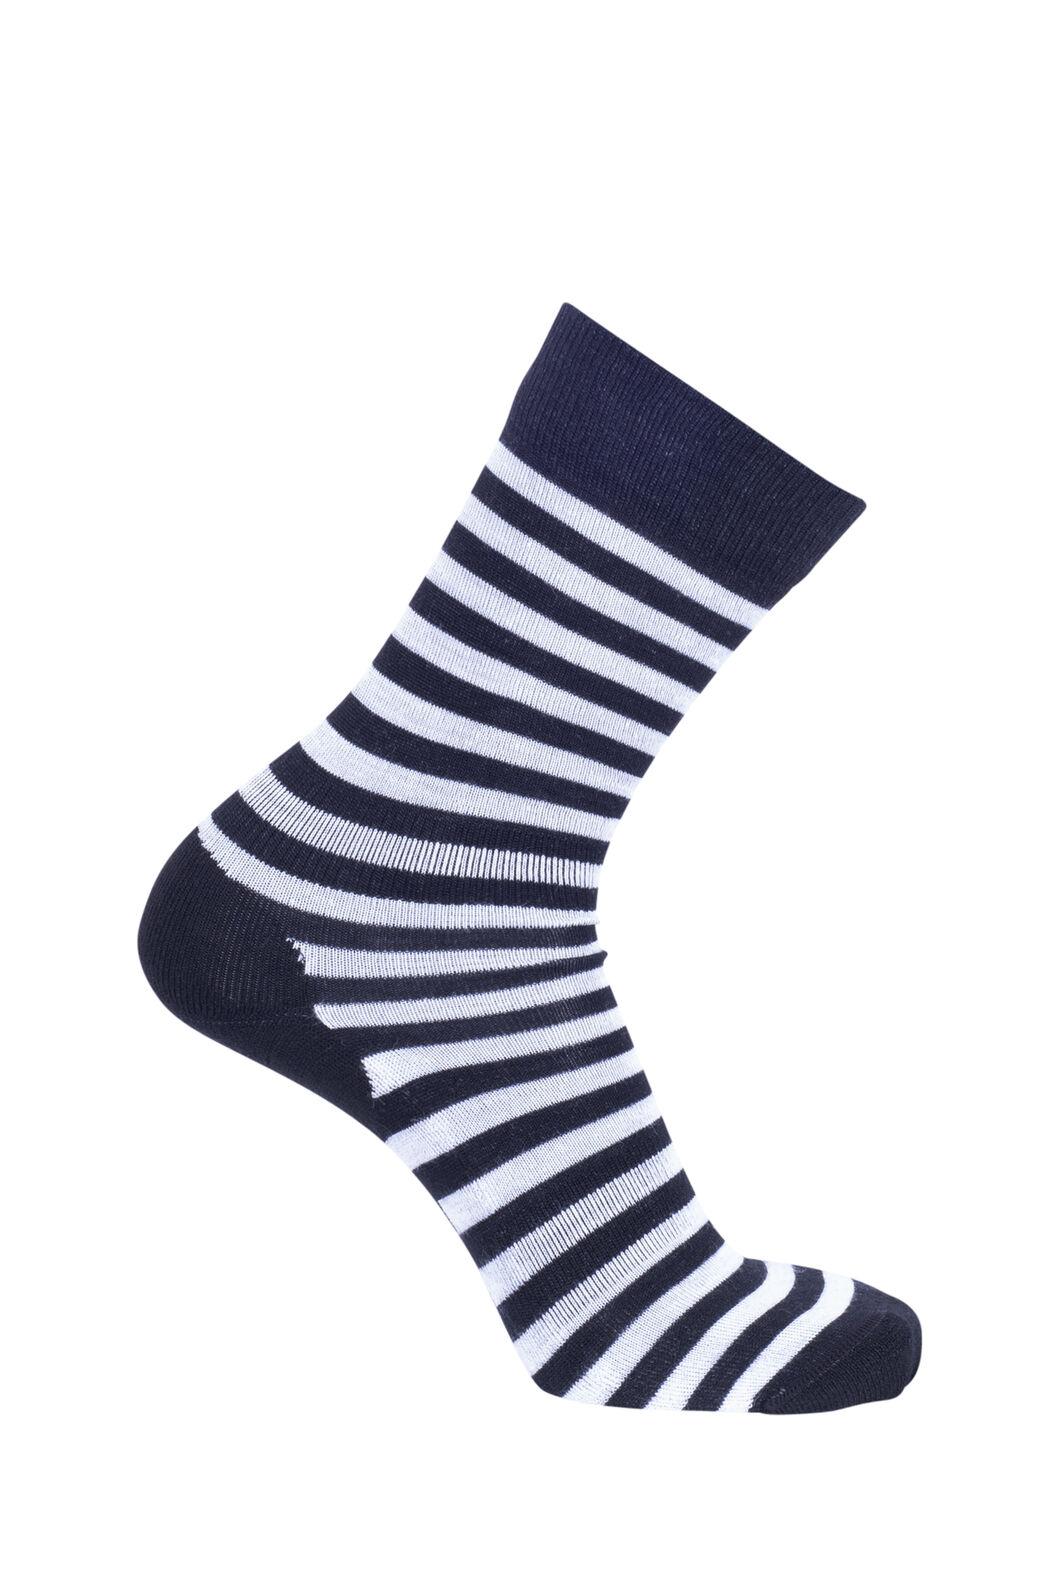 Macpac Merino Blend Footprint Socks, Black Stripe, hi-res